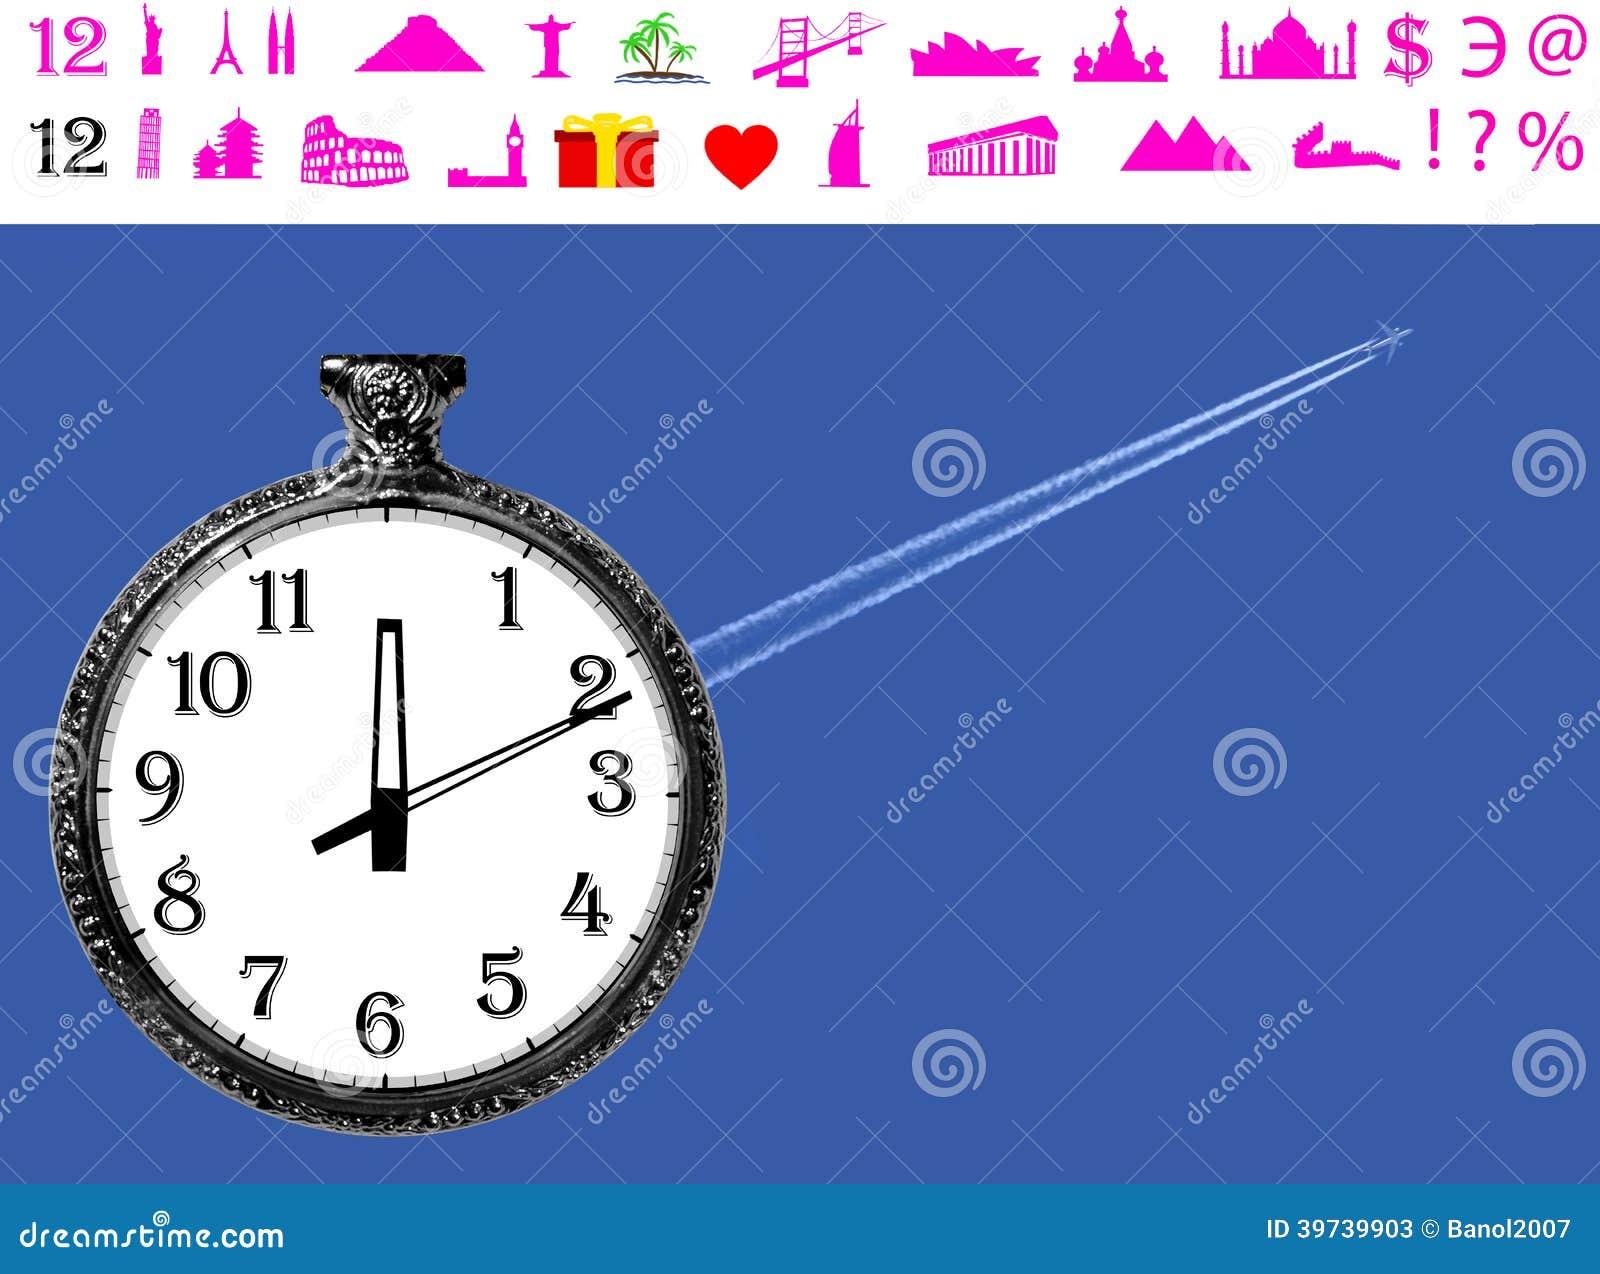 Time Travel To Start Of Landmark Icons Stock